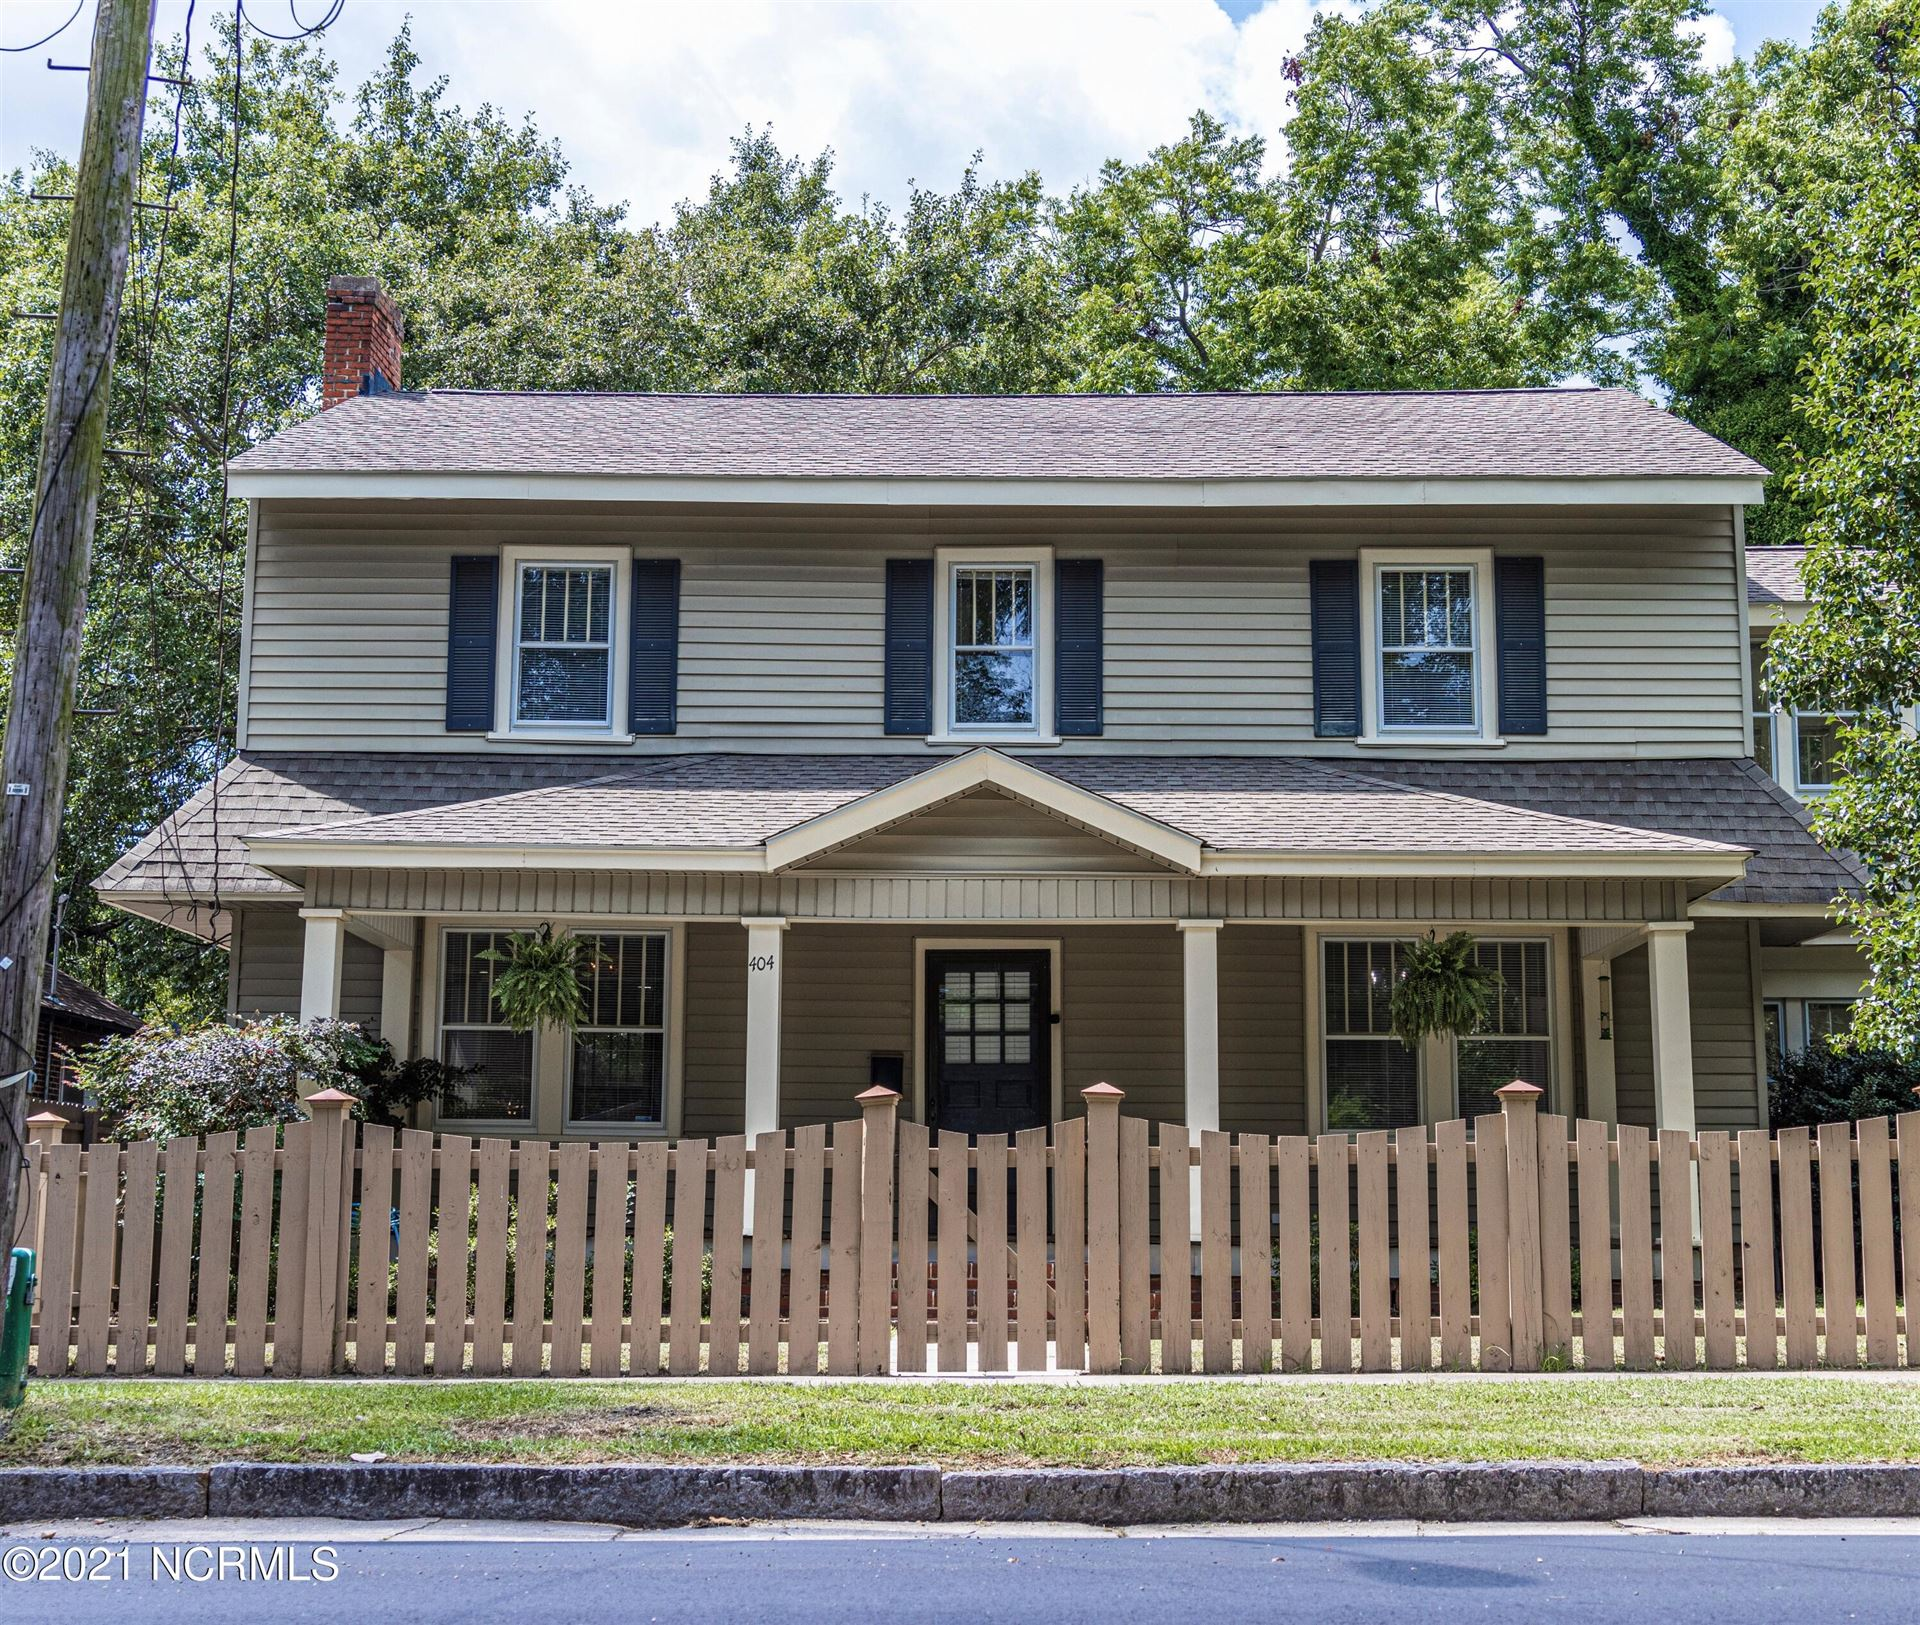 Photo of 404 Elizabeth Street, Greenville, NC 27834 (MLS # 100286272)